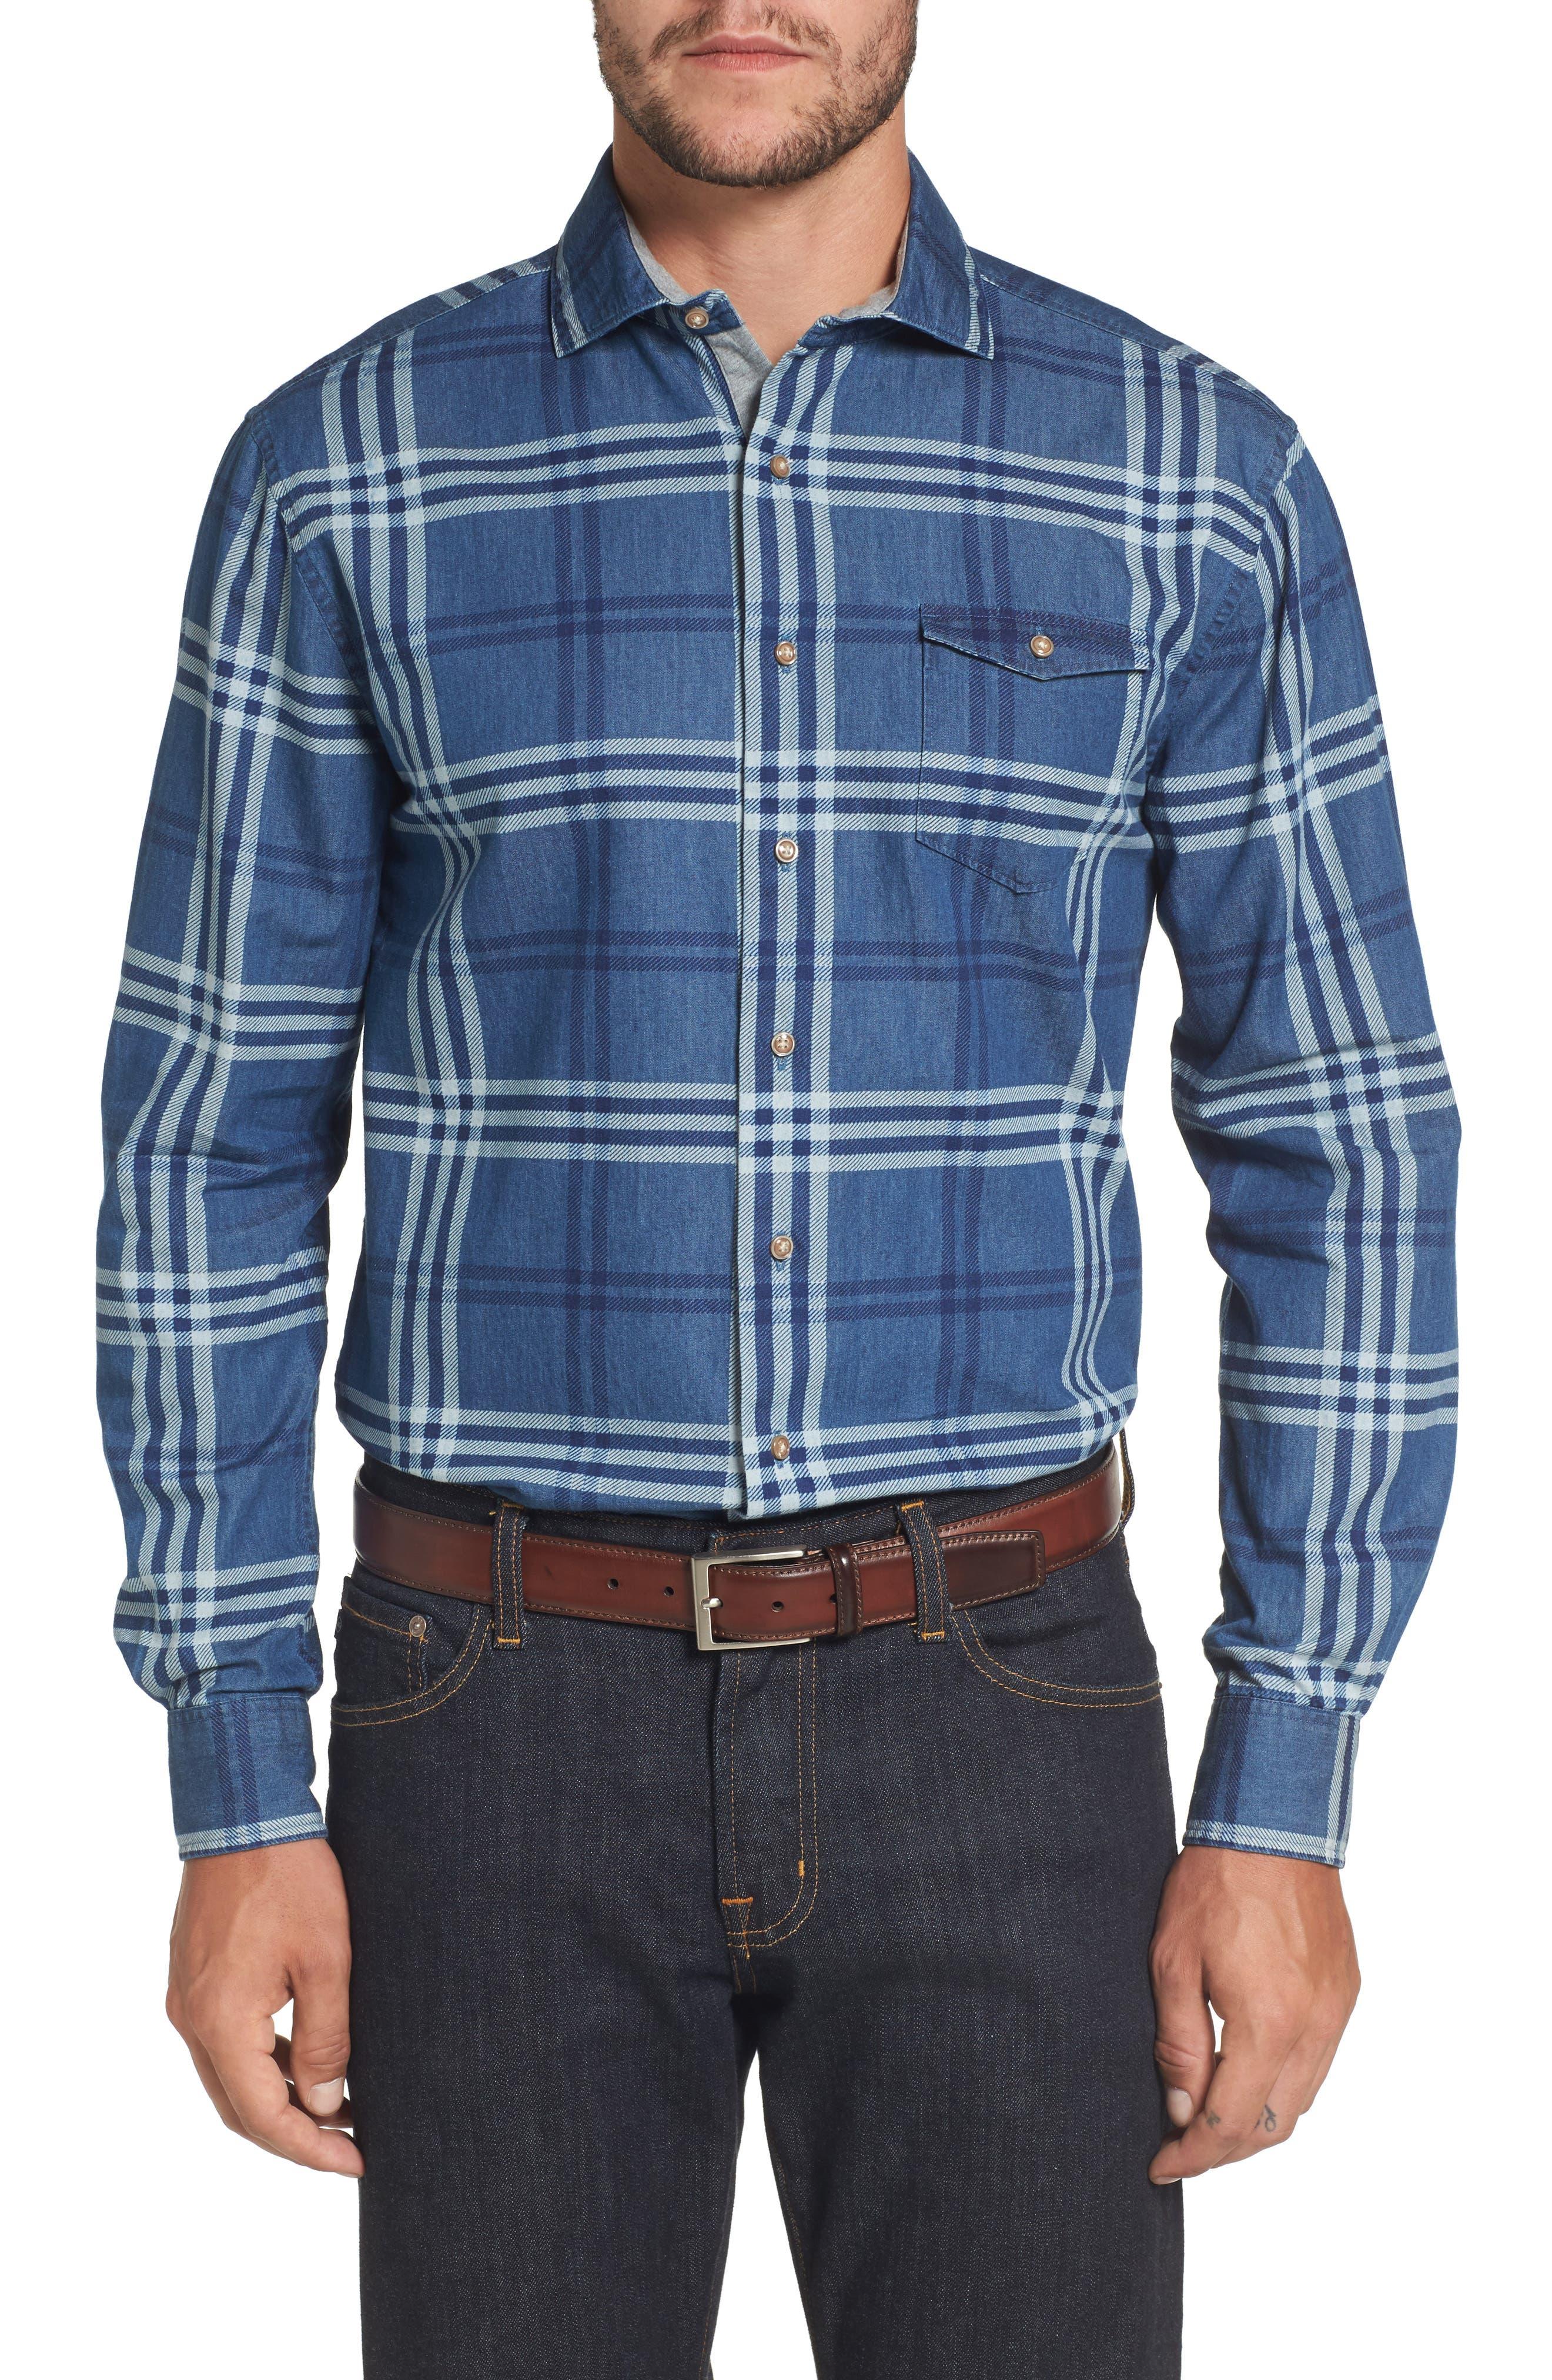 Breckenridge Plaid Sport Shirt,                             Main thumbnail 1, color,                             400